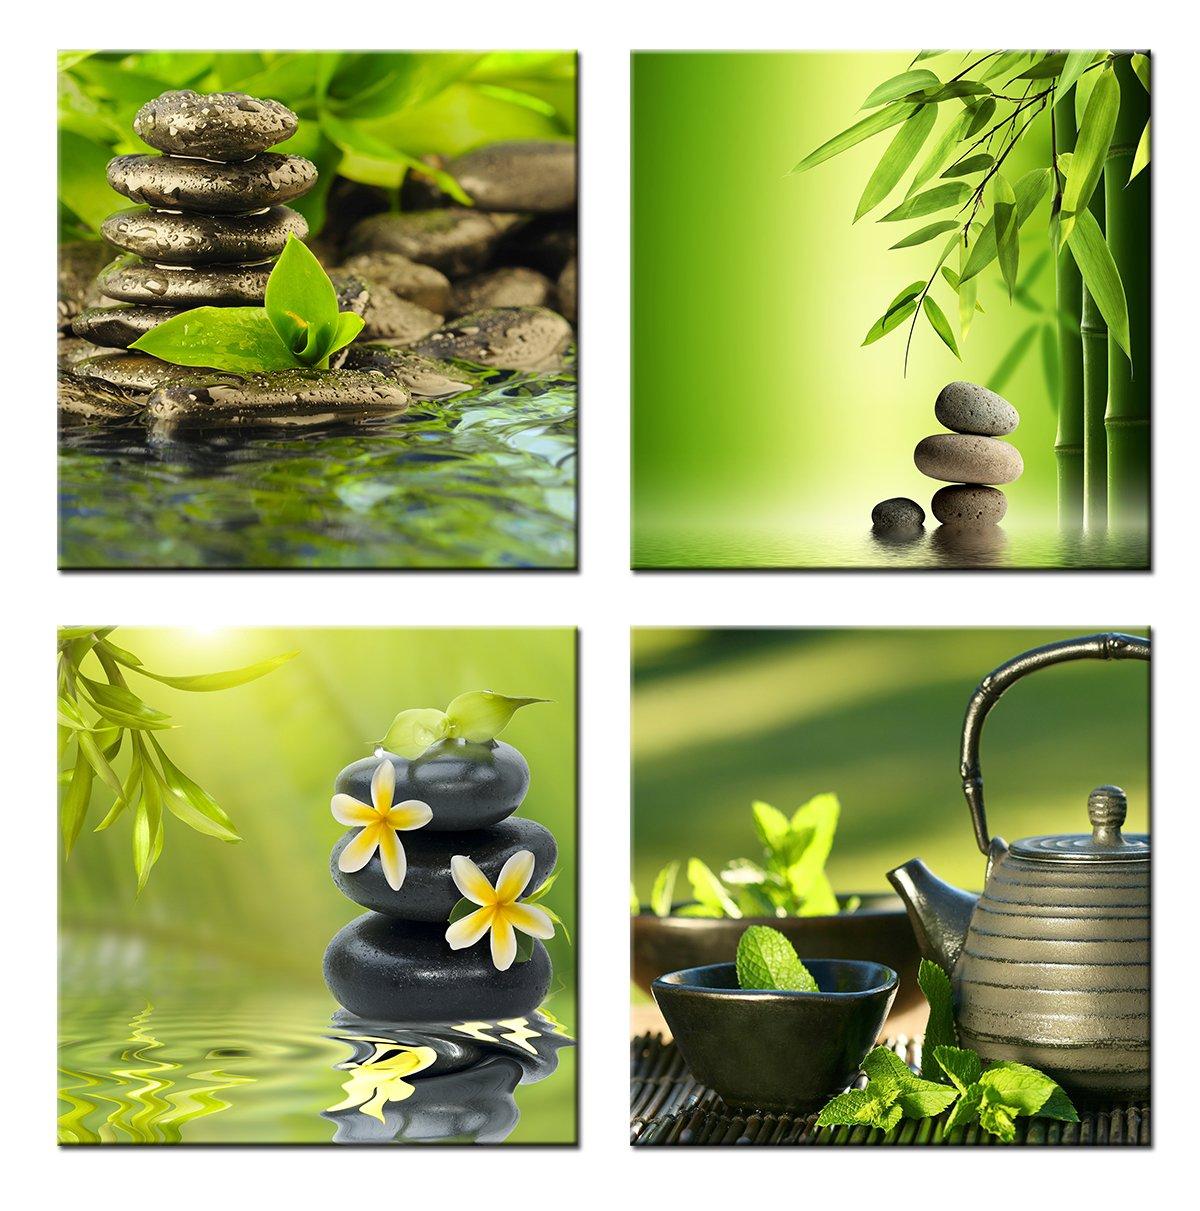 Zen Home Decorations: Amazon.com